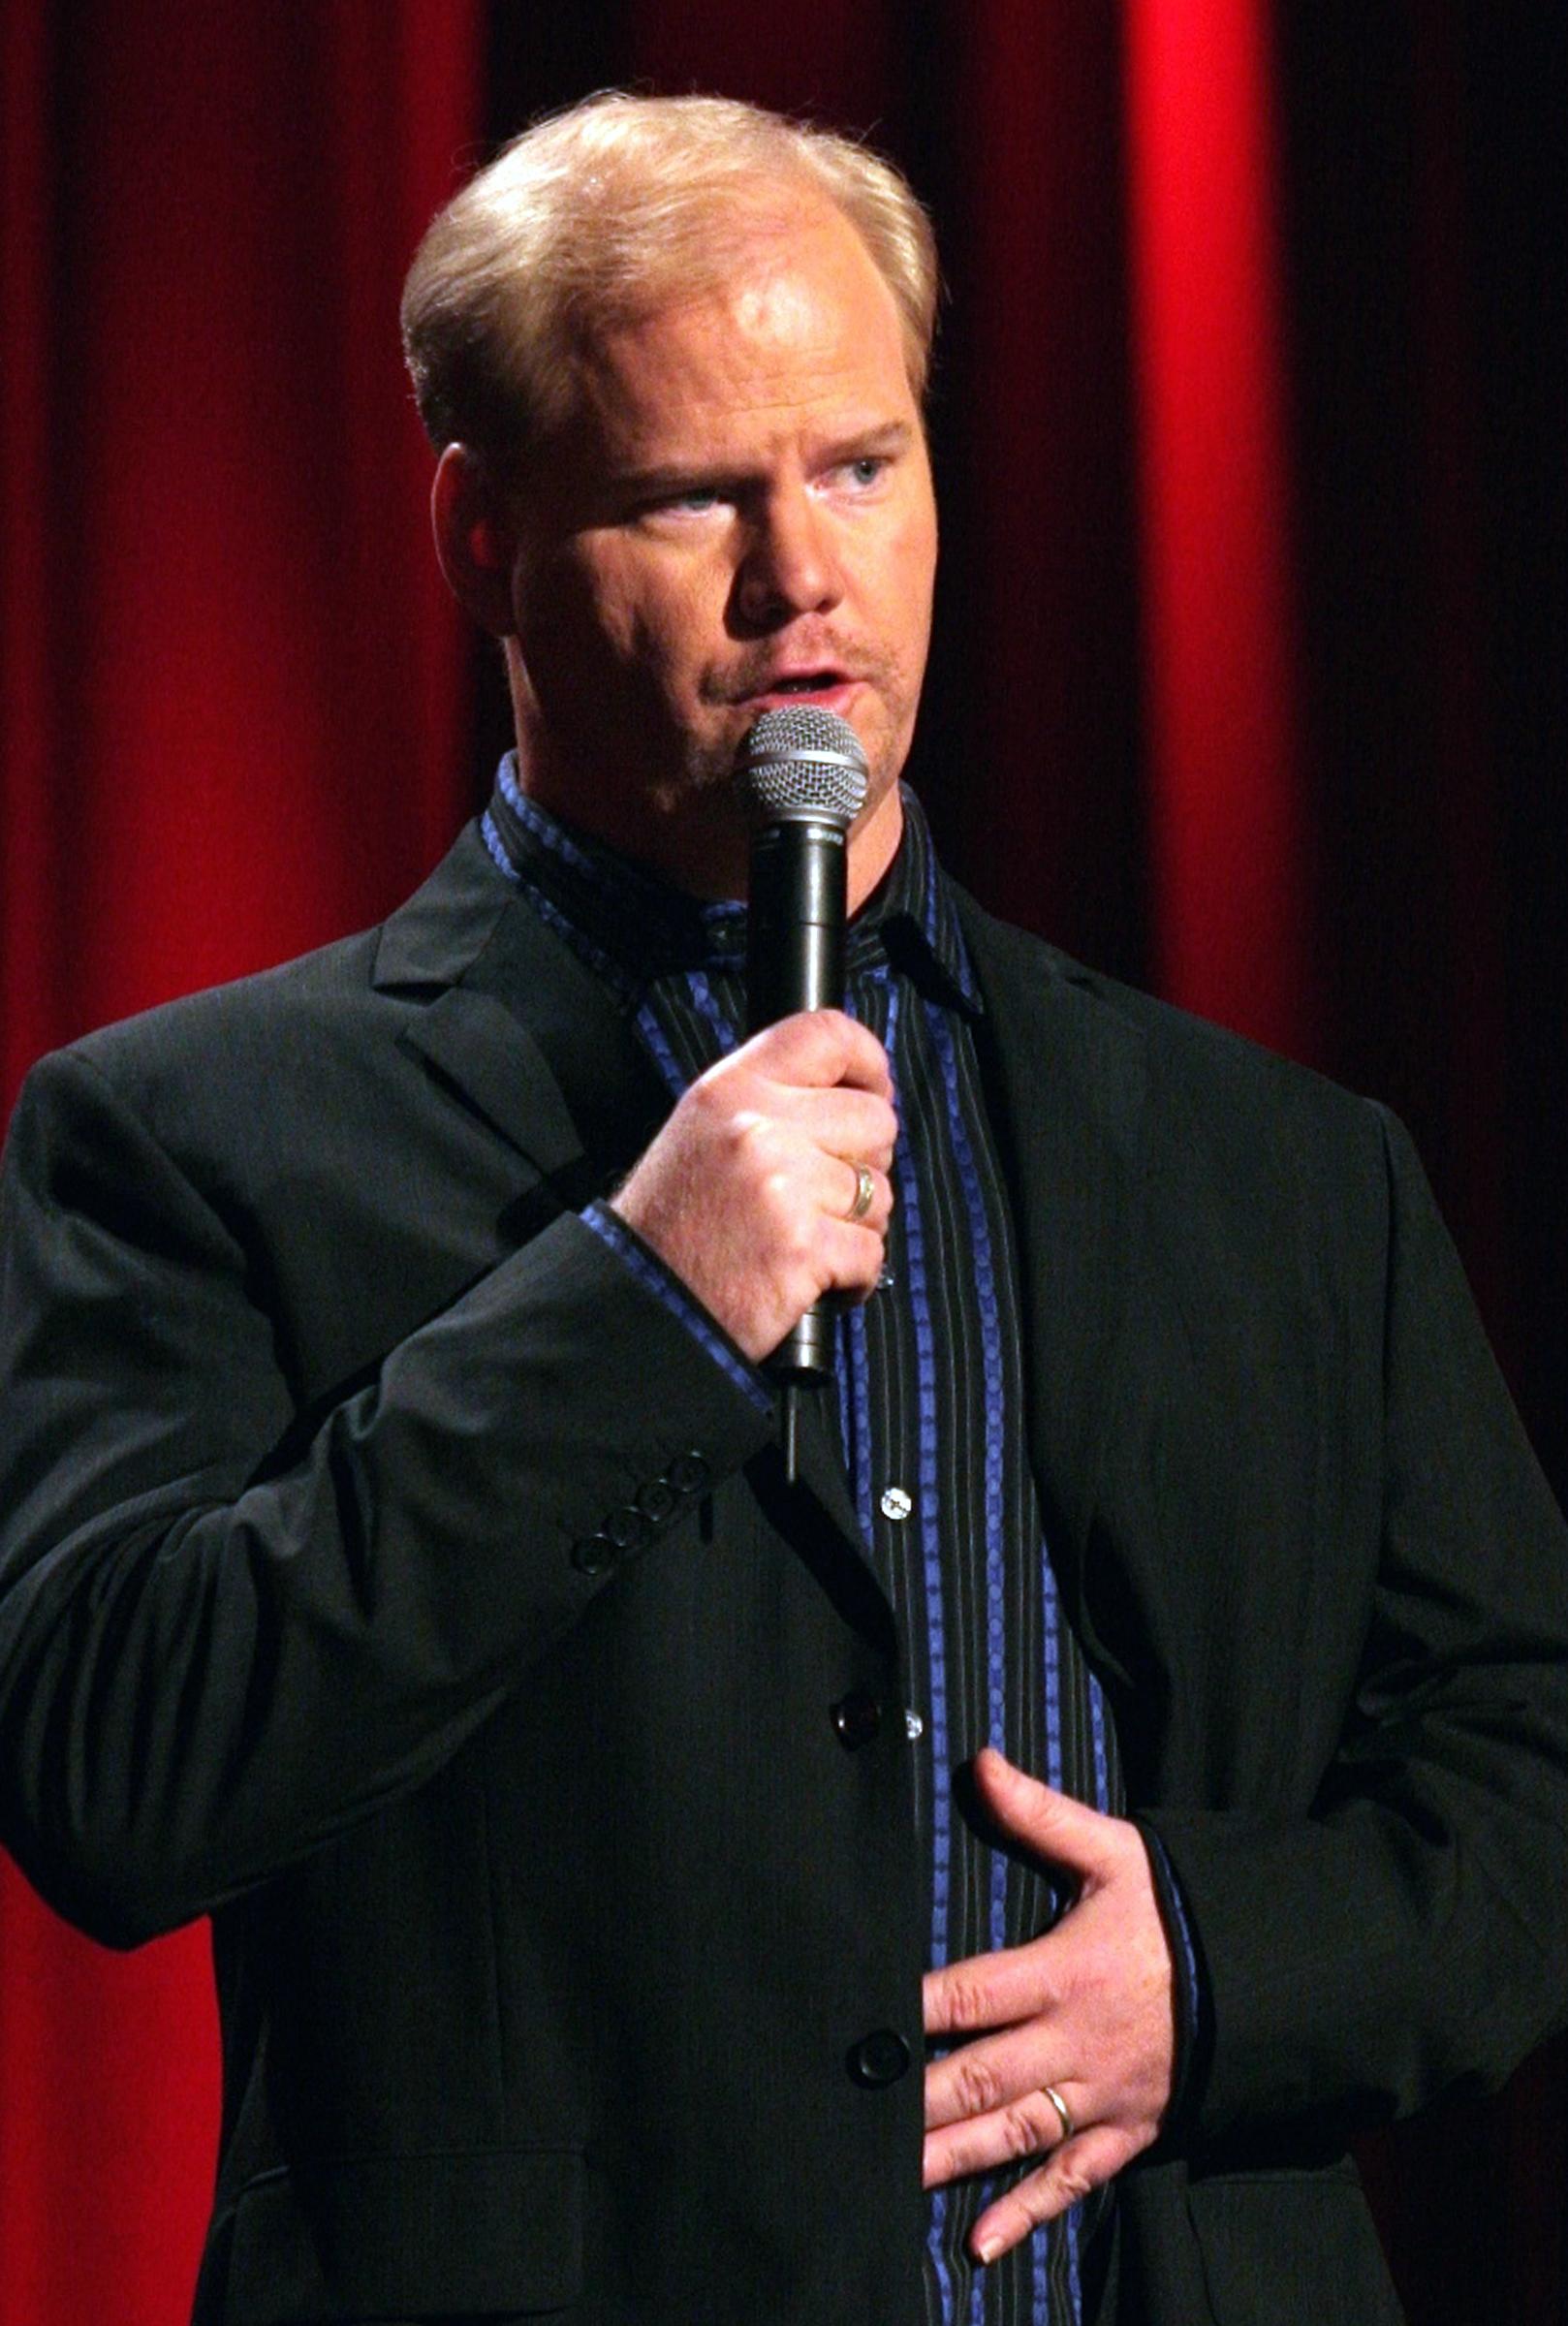 Comedian Jim Gaffigan to perform at Elliott Hall of Music